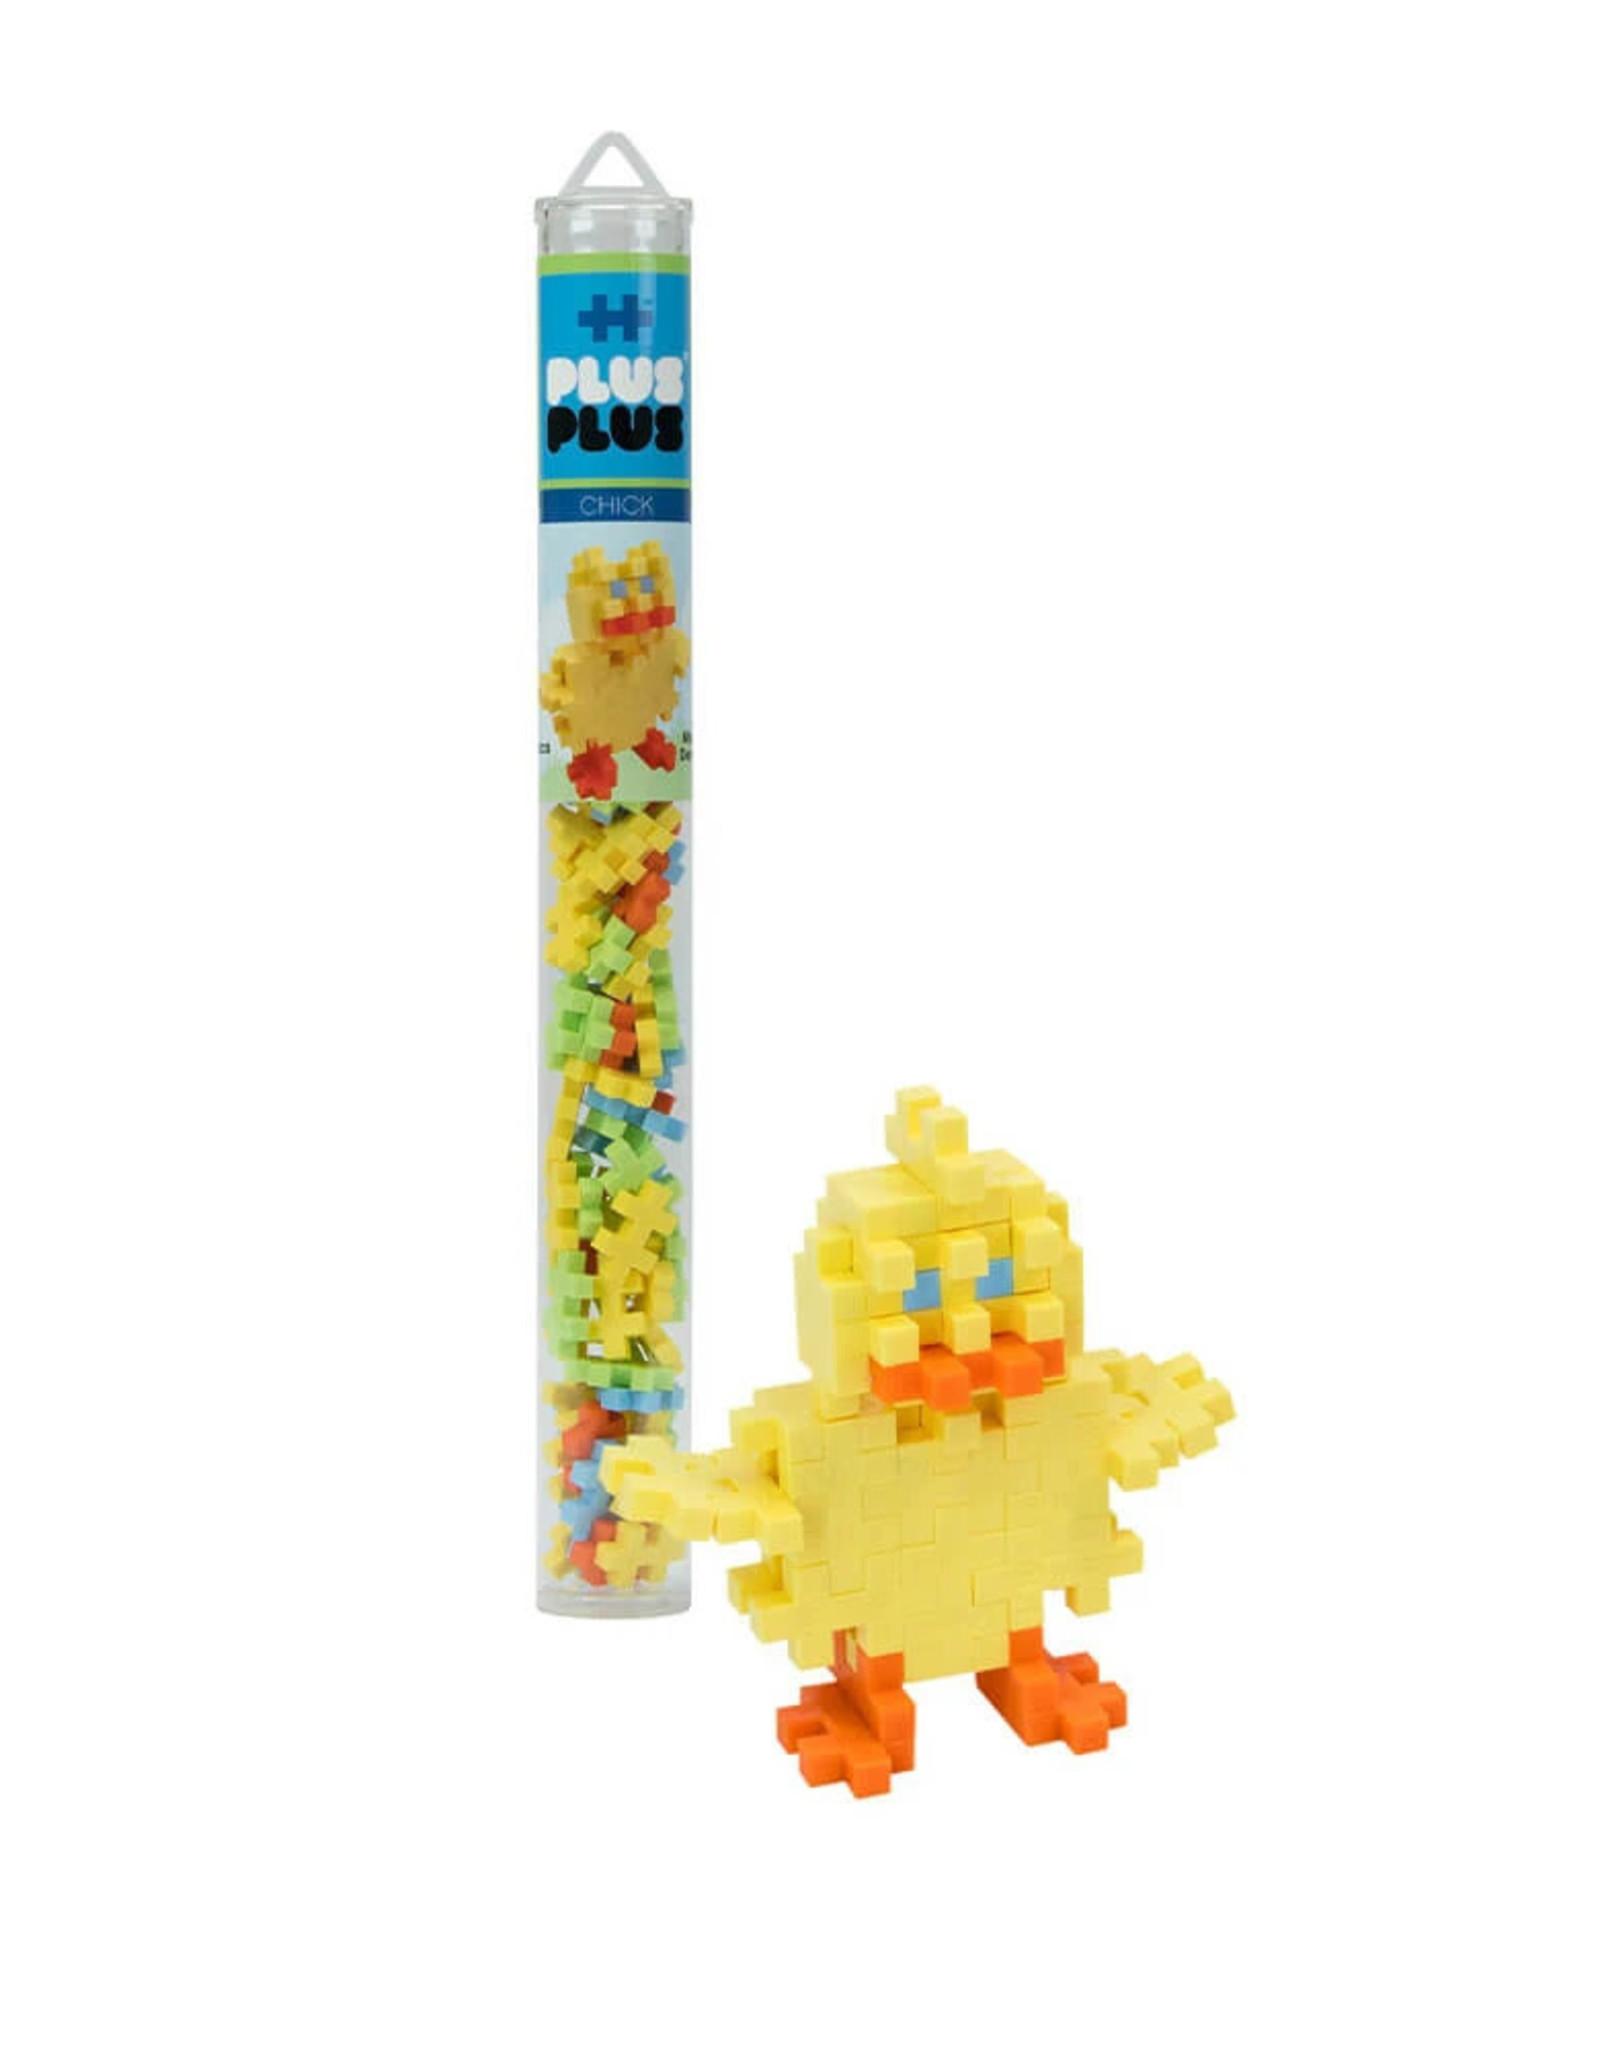 Plus-Plus Tube - Chick Mix